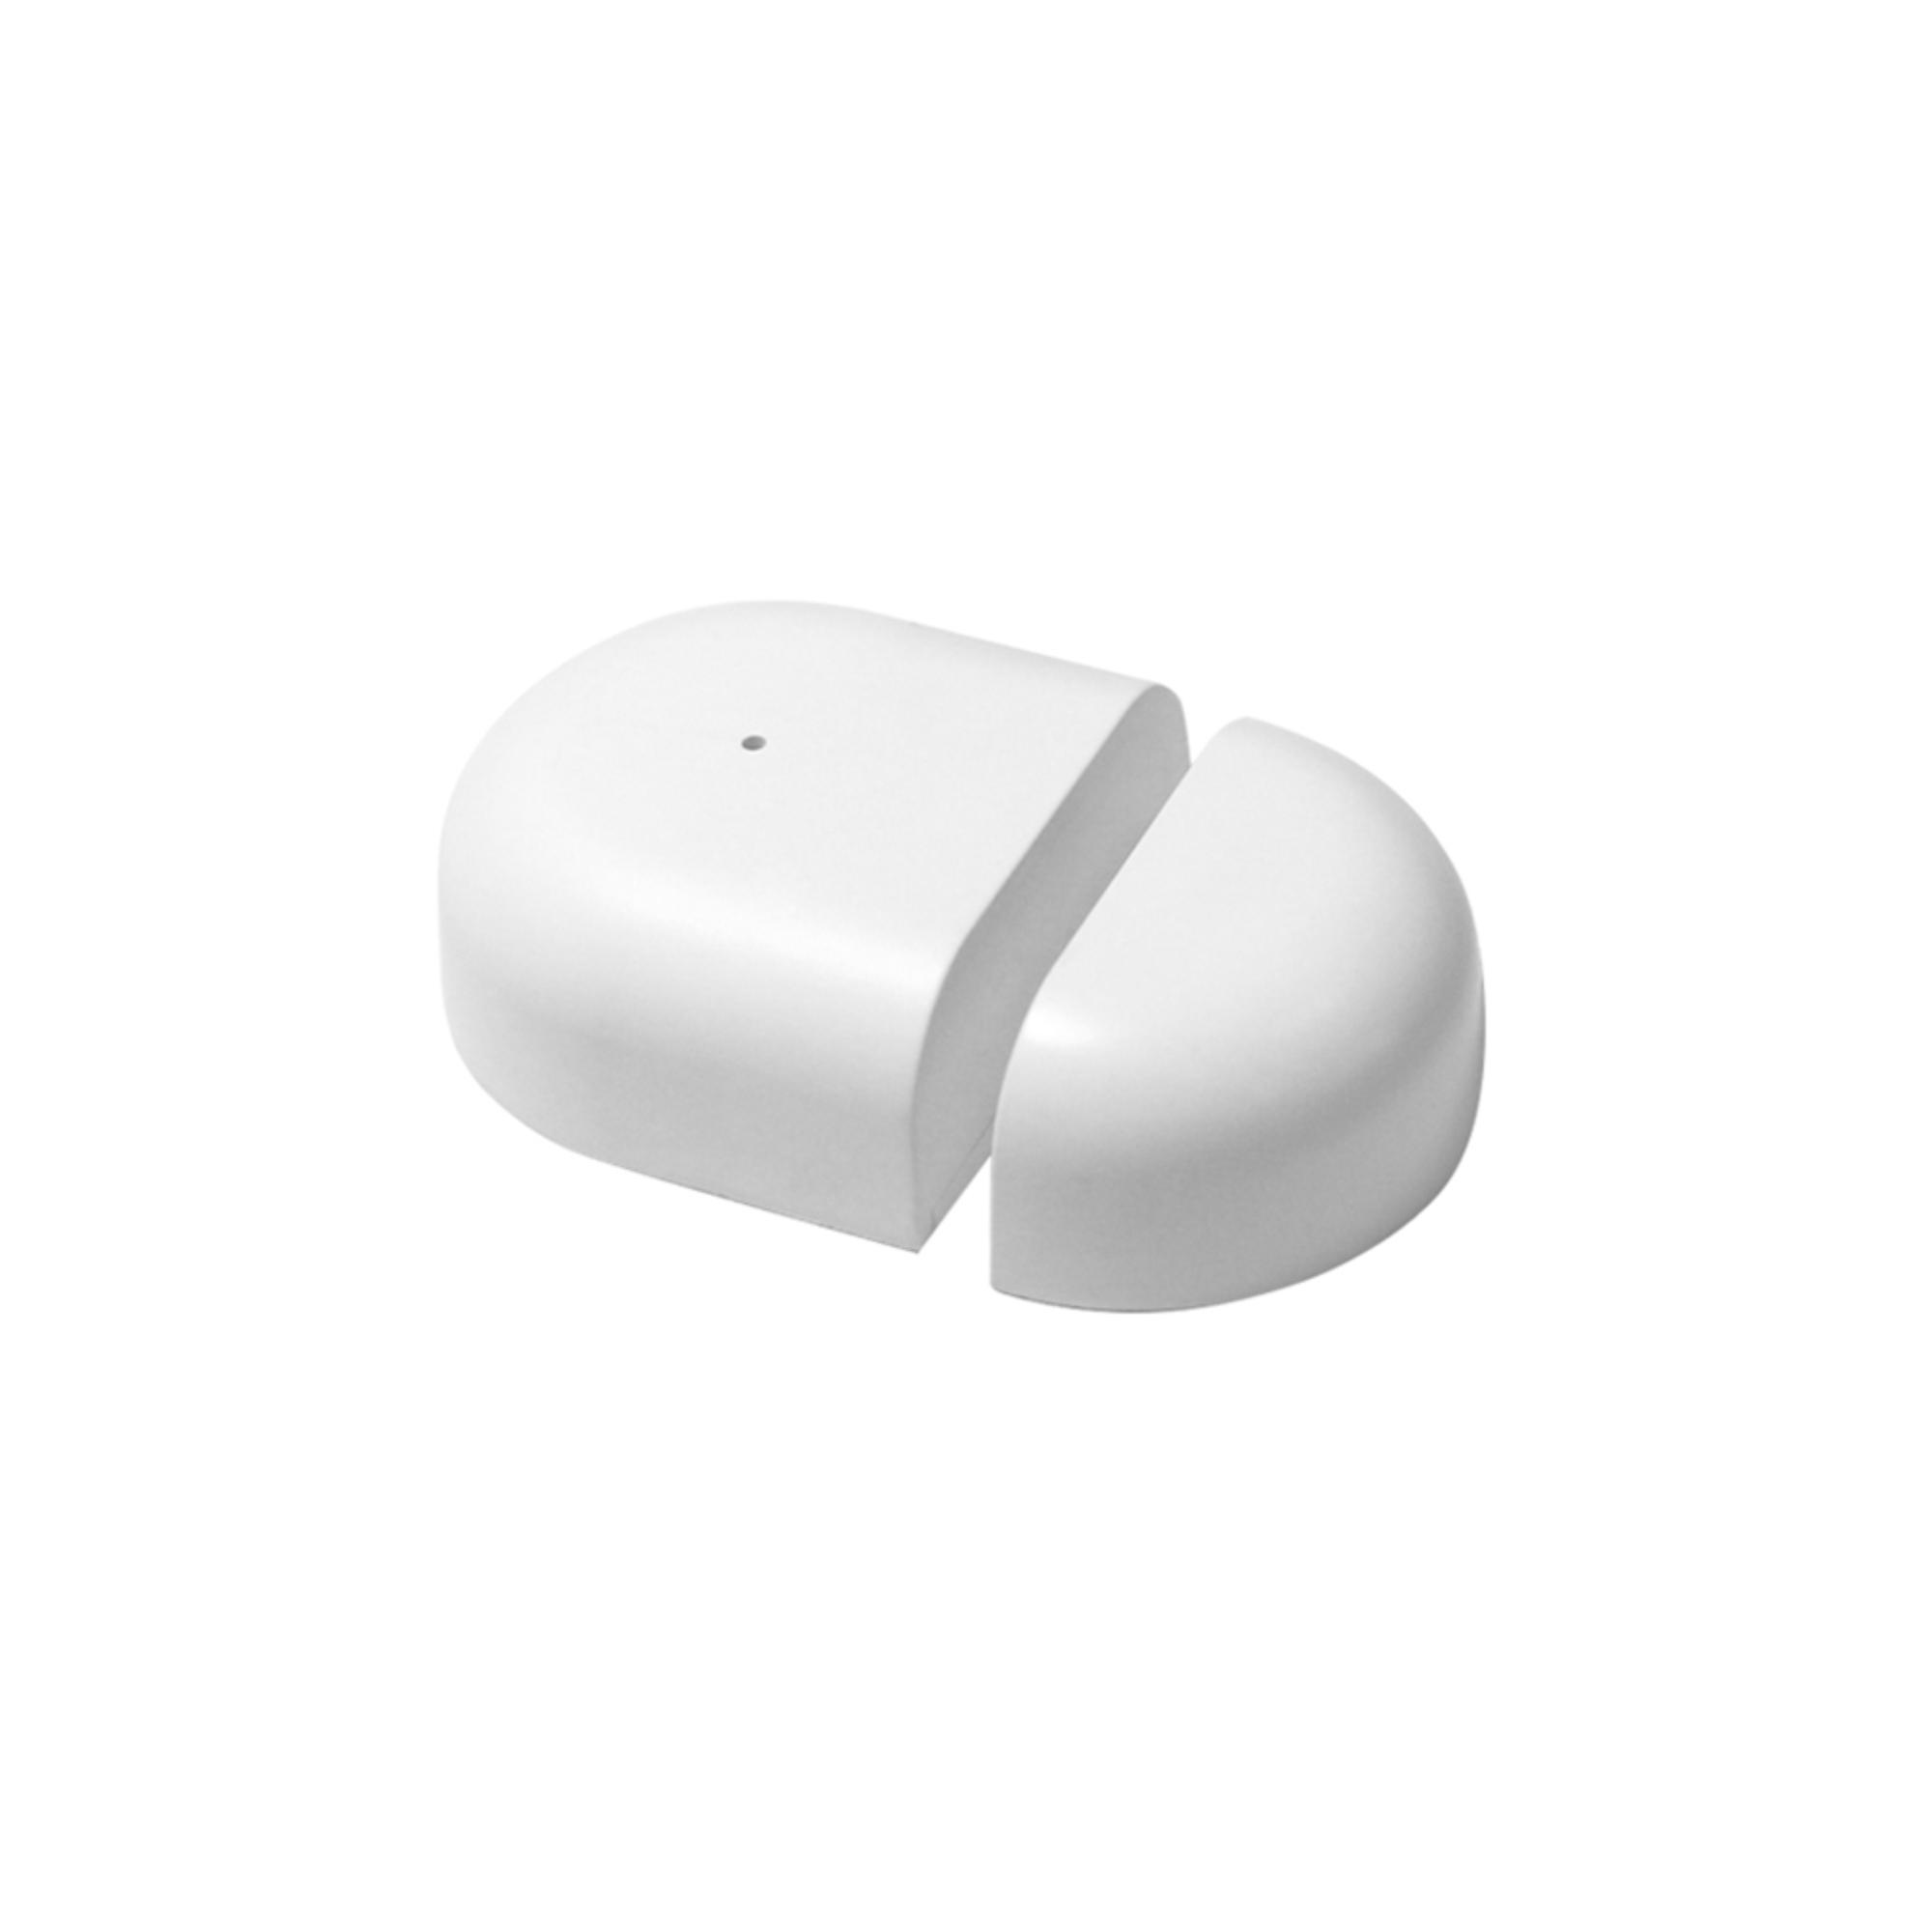 Sensref Bluetooth Based Mini Magnetic Door Sensor